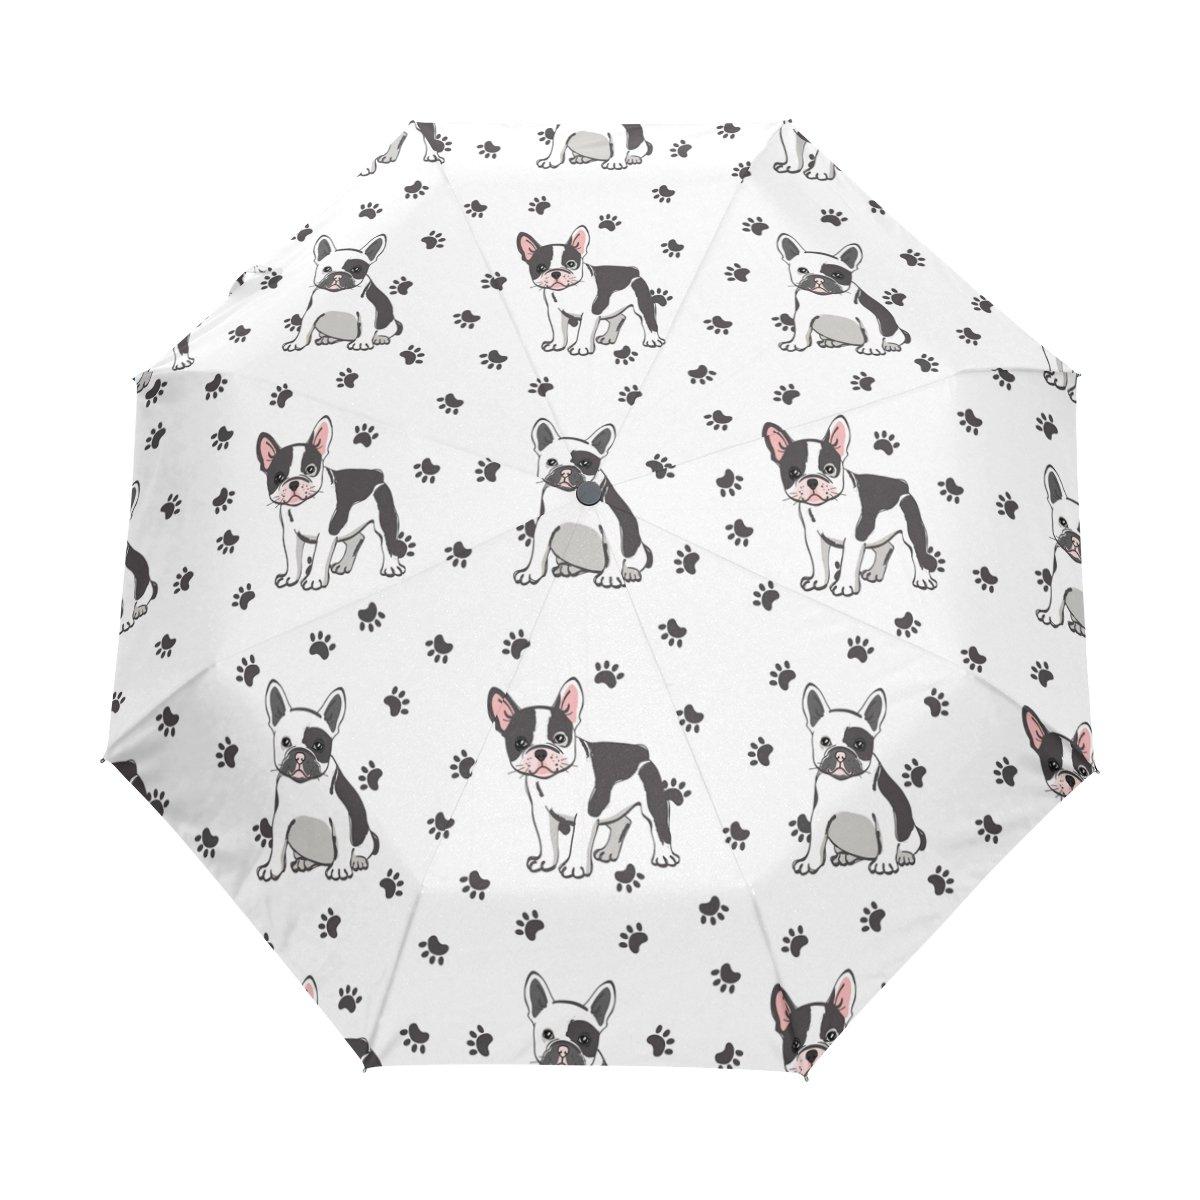 Naanle French Bulldog Dog Paw Print Auto Open Close Foldable Windproof Travel Umbrella